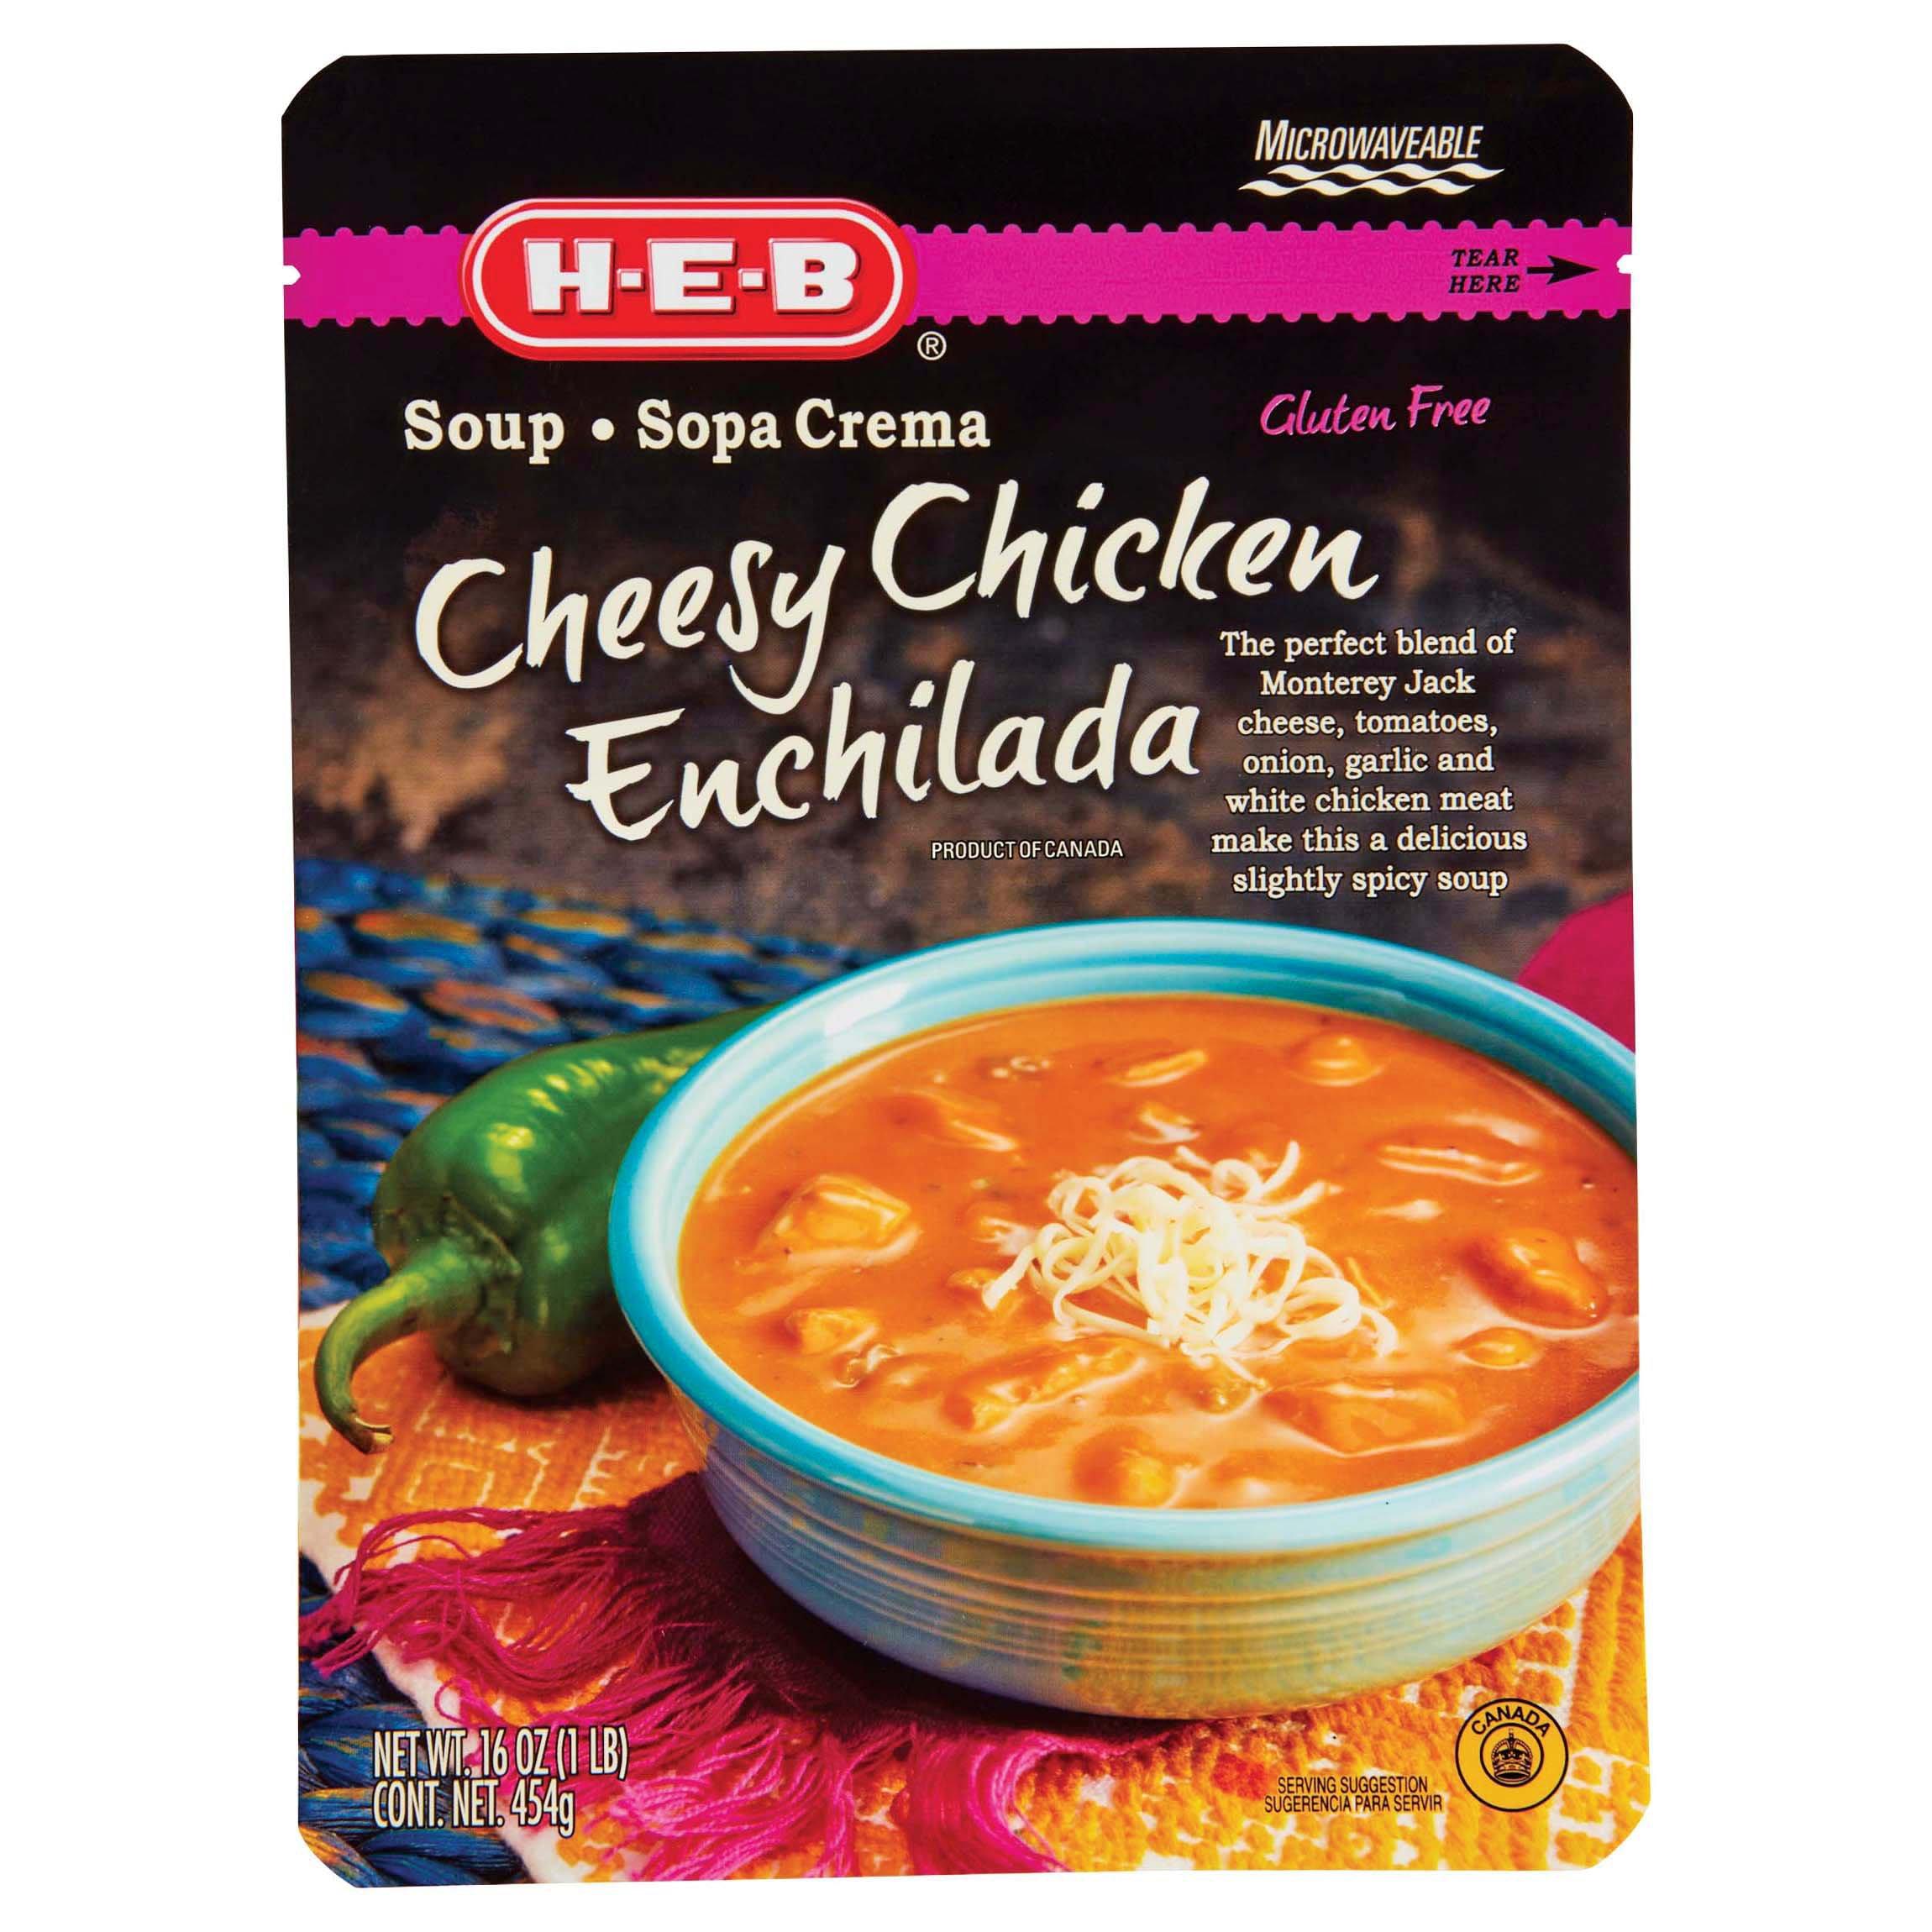 H E B Cheesy Chicken Enchilada Soup Shop Soups Chili At H E B